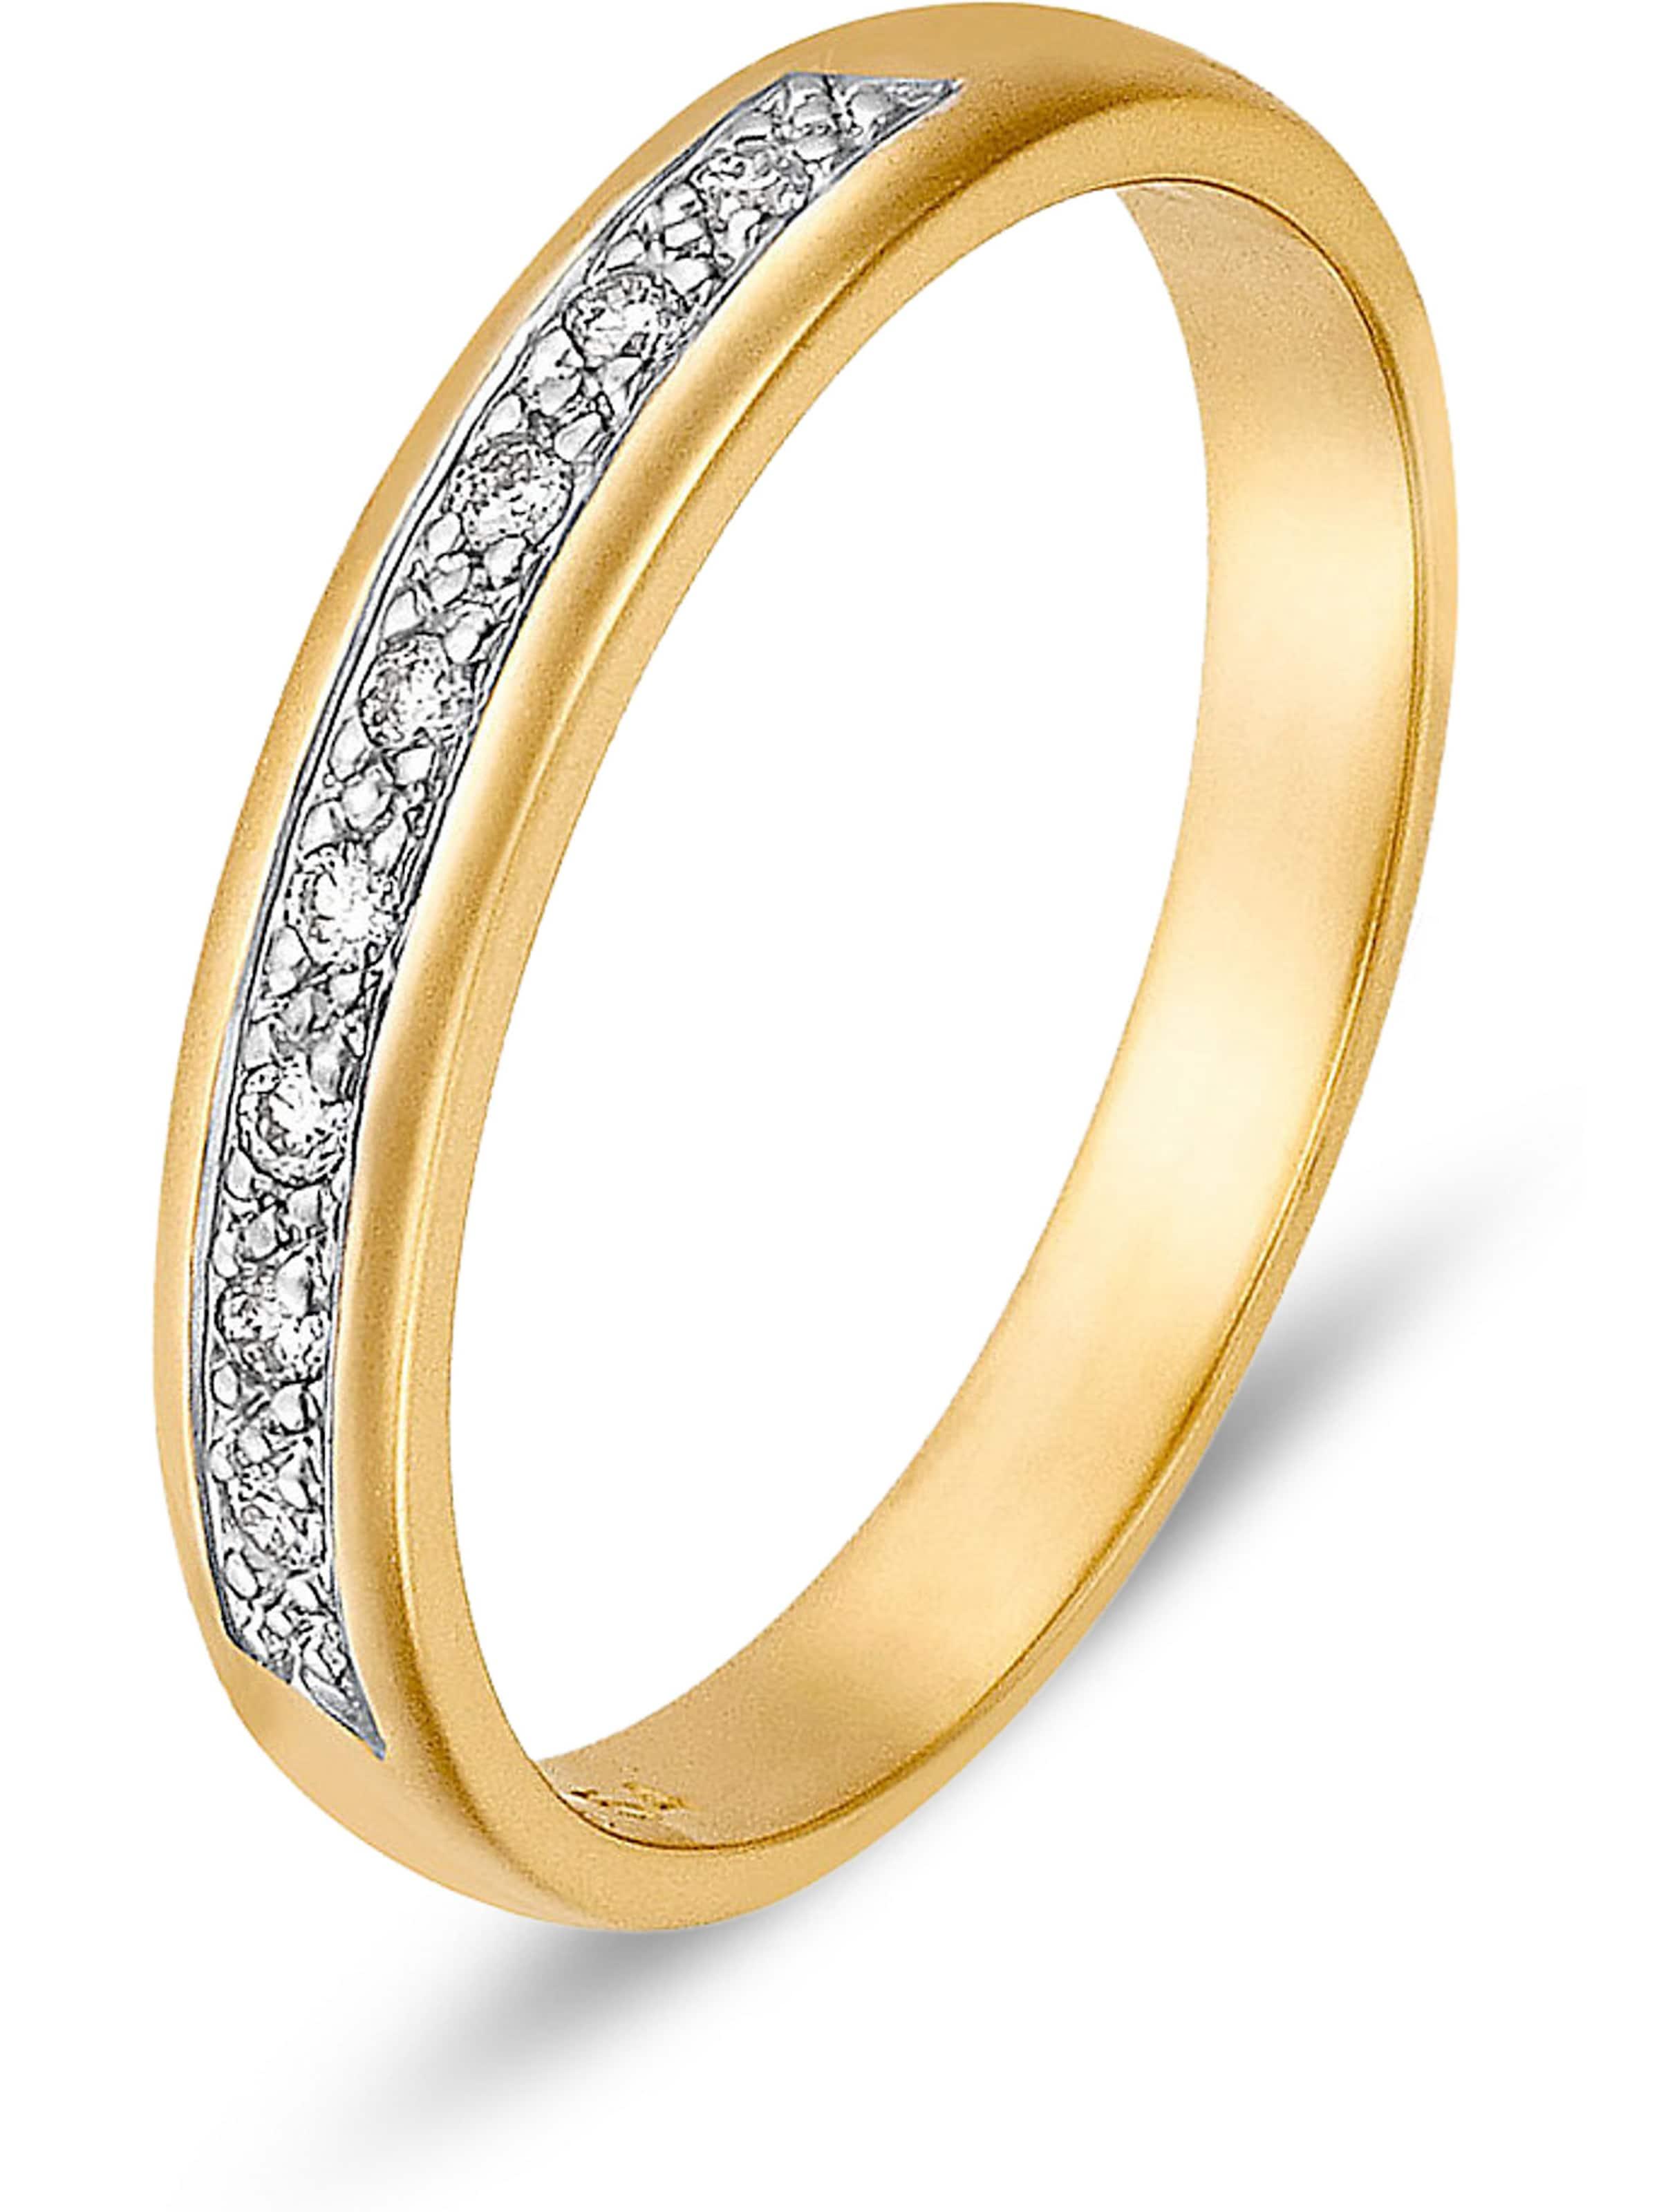 GoldTransparent Ring Christ Ring In Christ Christ In In Ring GoldTransparent Kc53uFJTl1